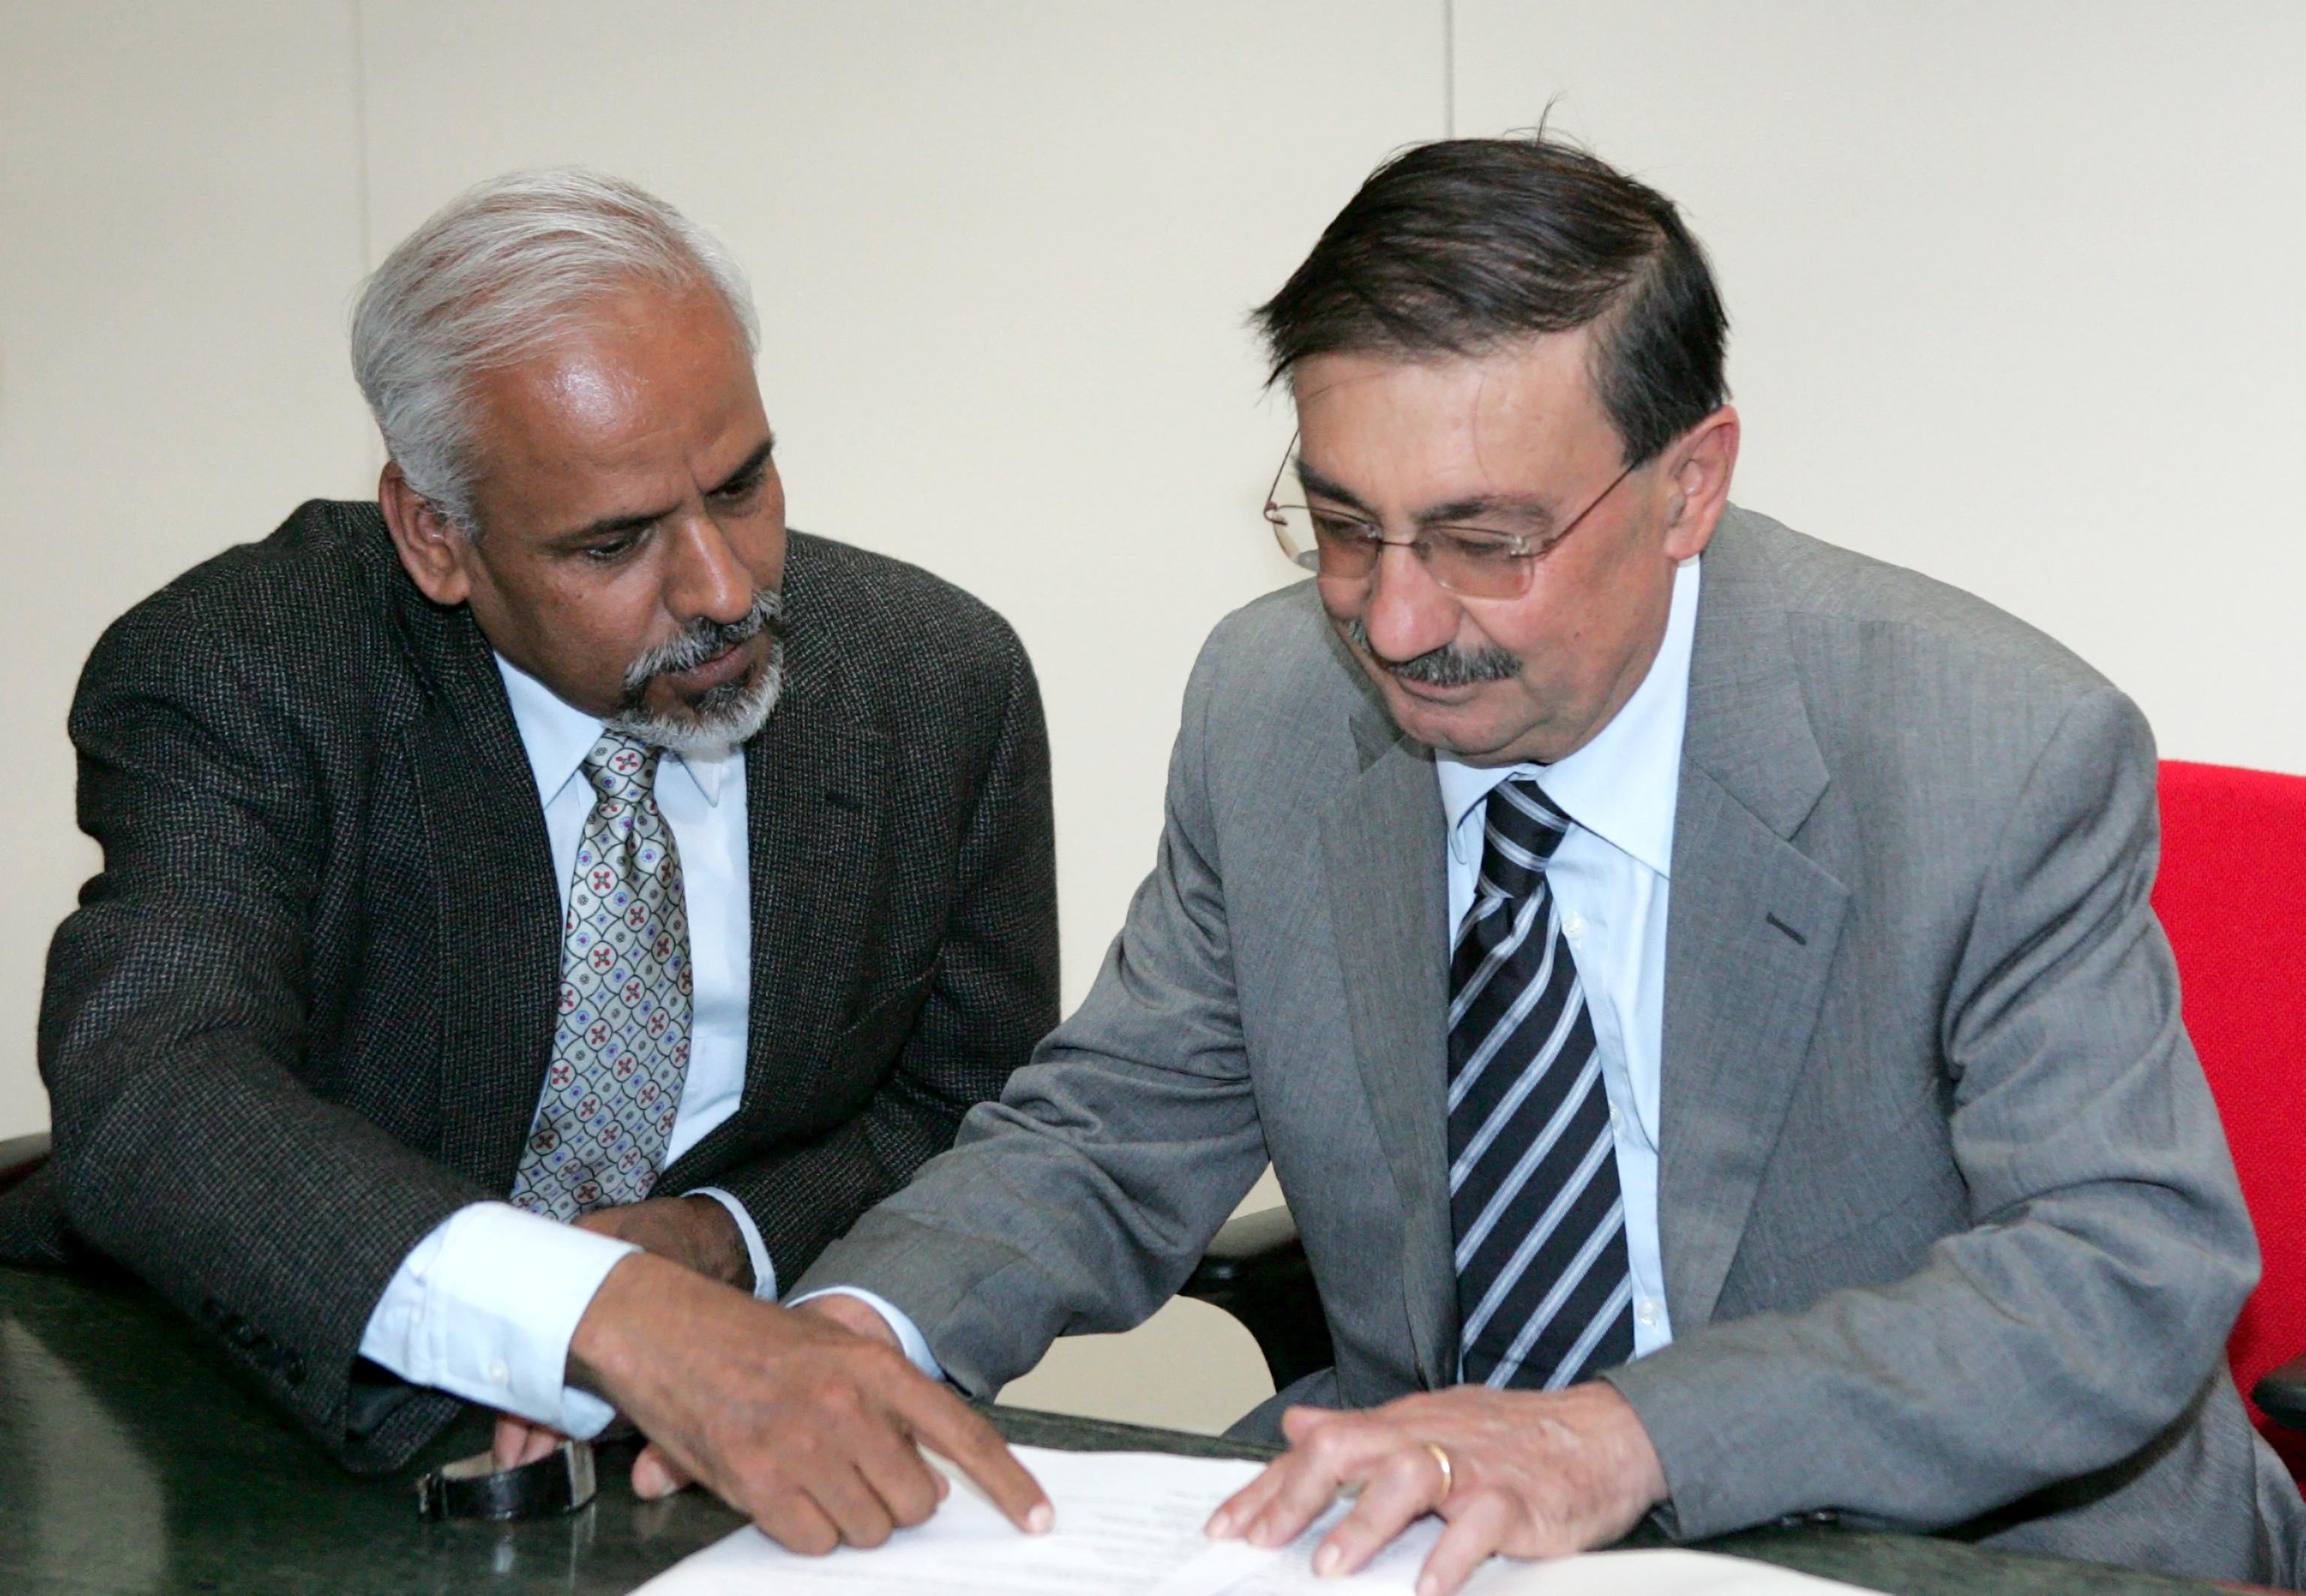 L. Maiani, K.R. Sreenivasan and J. Iliopoulos